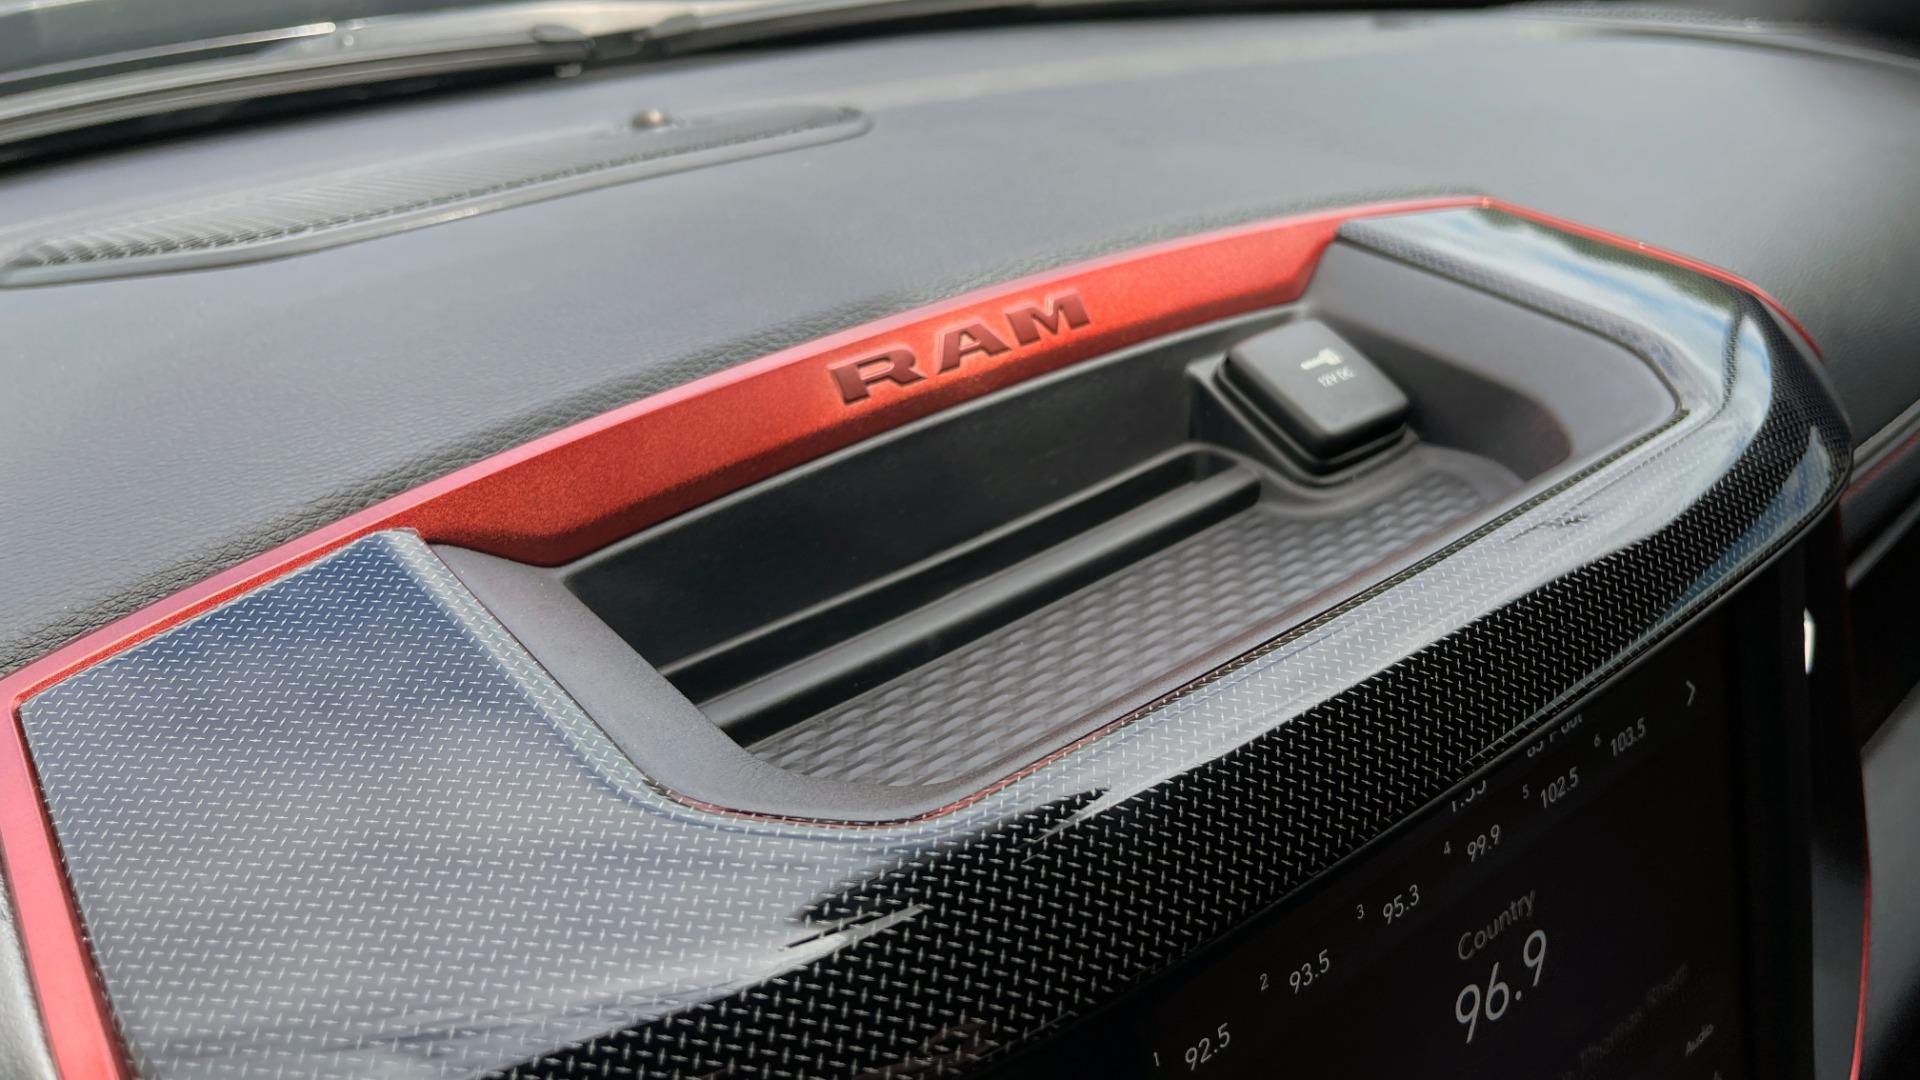 Used 2019 Ram 1500 REBEL QUADCAB 4X4 / 5.7L HEMI / 8-SPD AUTO / REMOTE START / PARK ASSIST for sale $44,495 at Formula Imports in Charlotte NC 28227 46